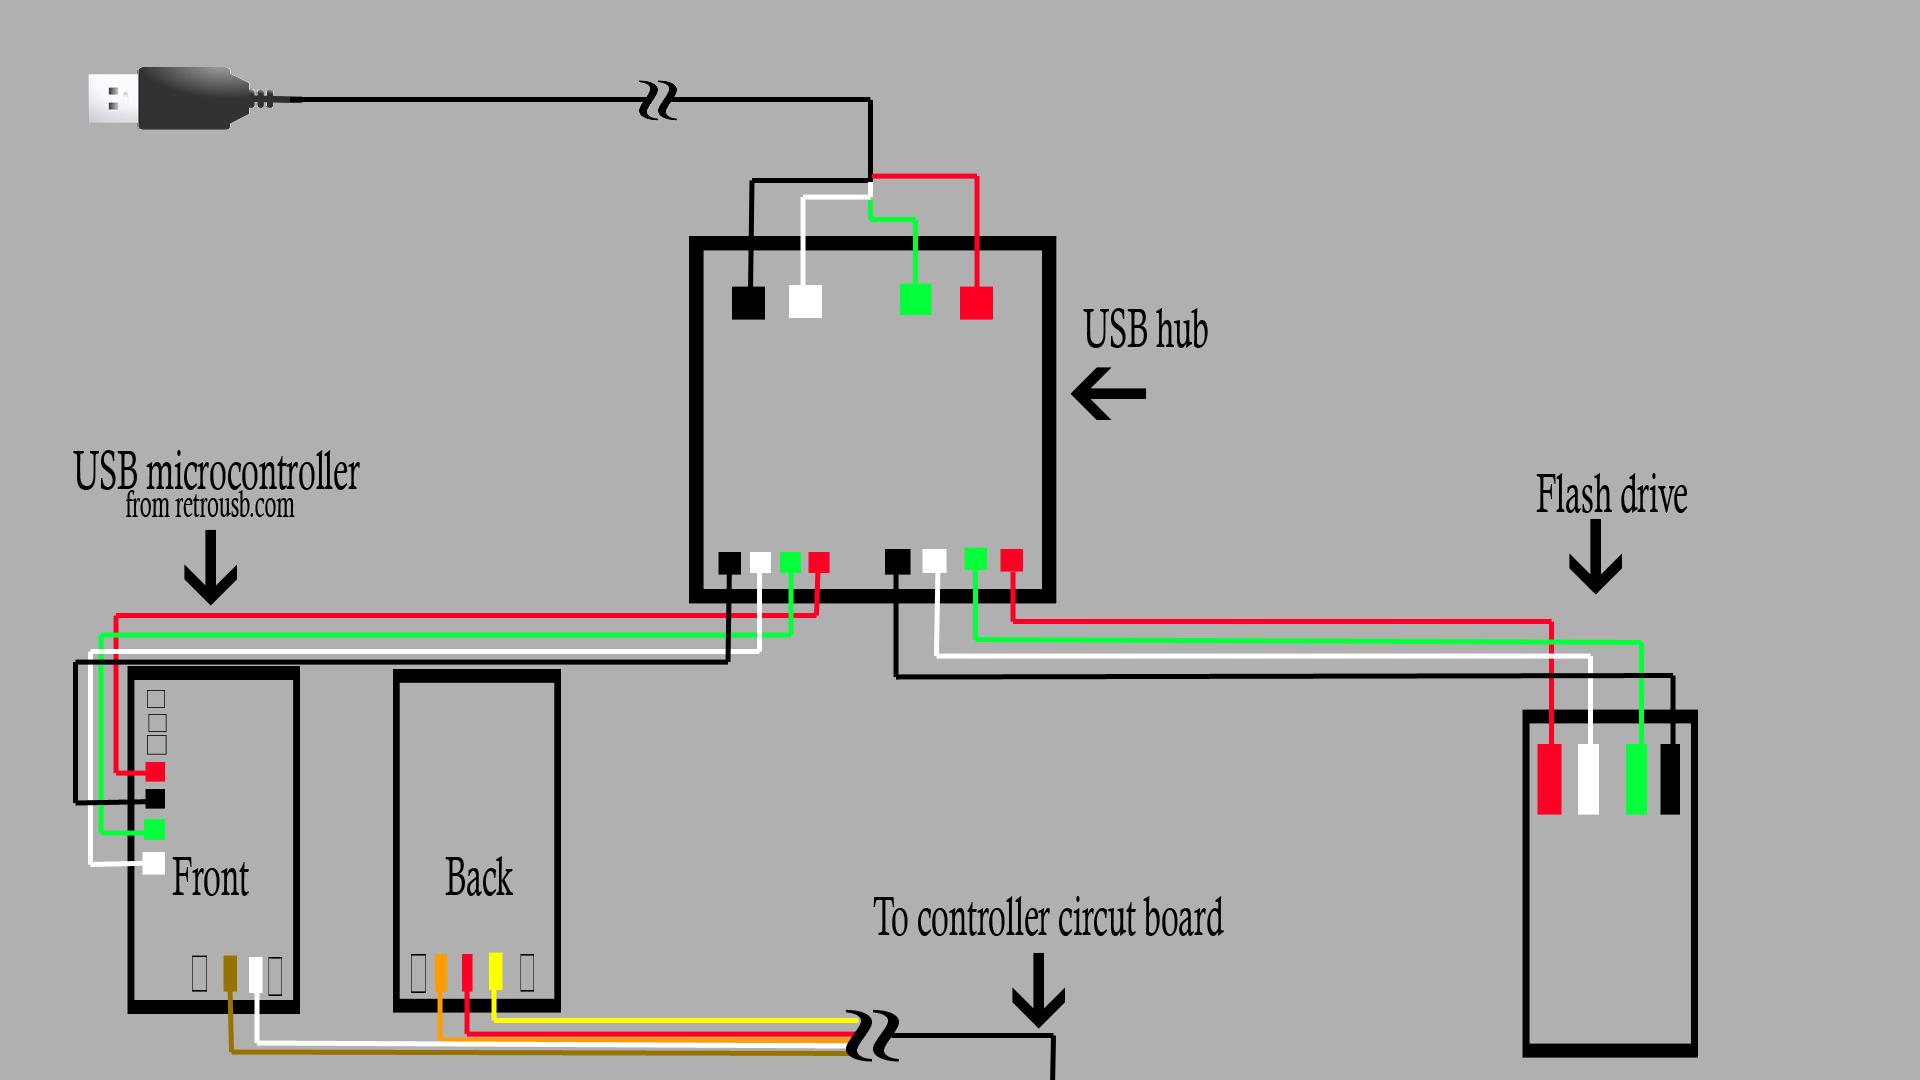 Usd Wiring Diagram | Wiring Diagram - Usb Cable Wiring Diagram